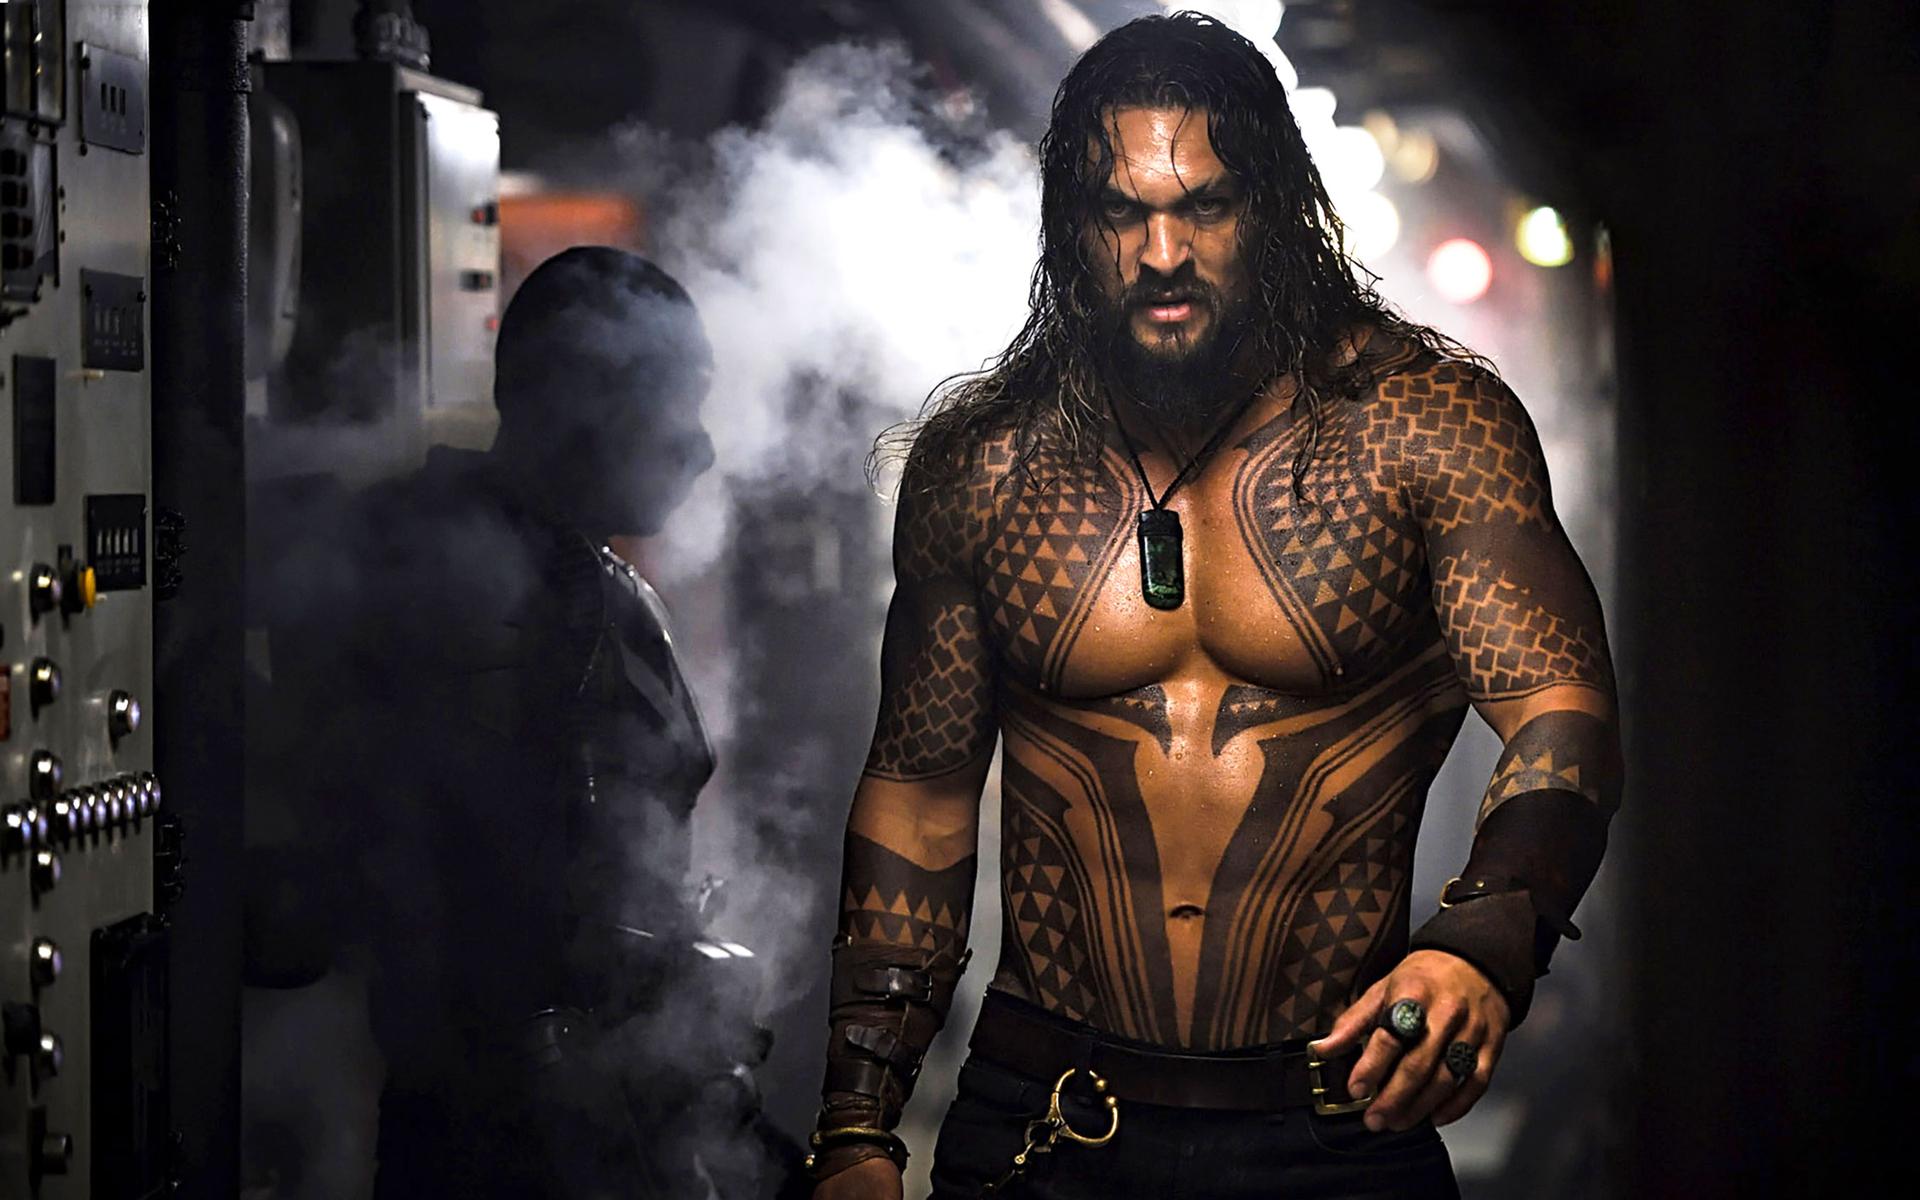 Aquaman Movie Free Download In Hindi In 1080: 1920x1200 Jason Momoa In Aquaman 2018 1080P Resolution HD